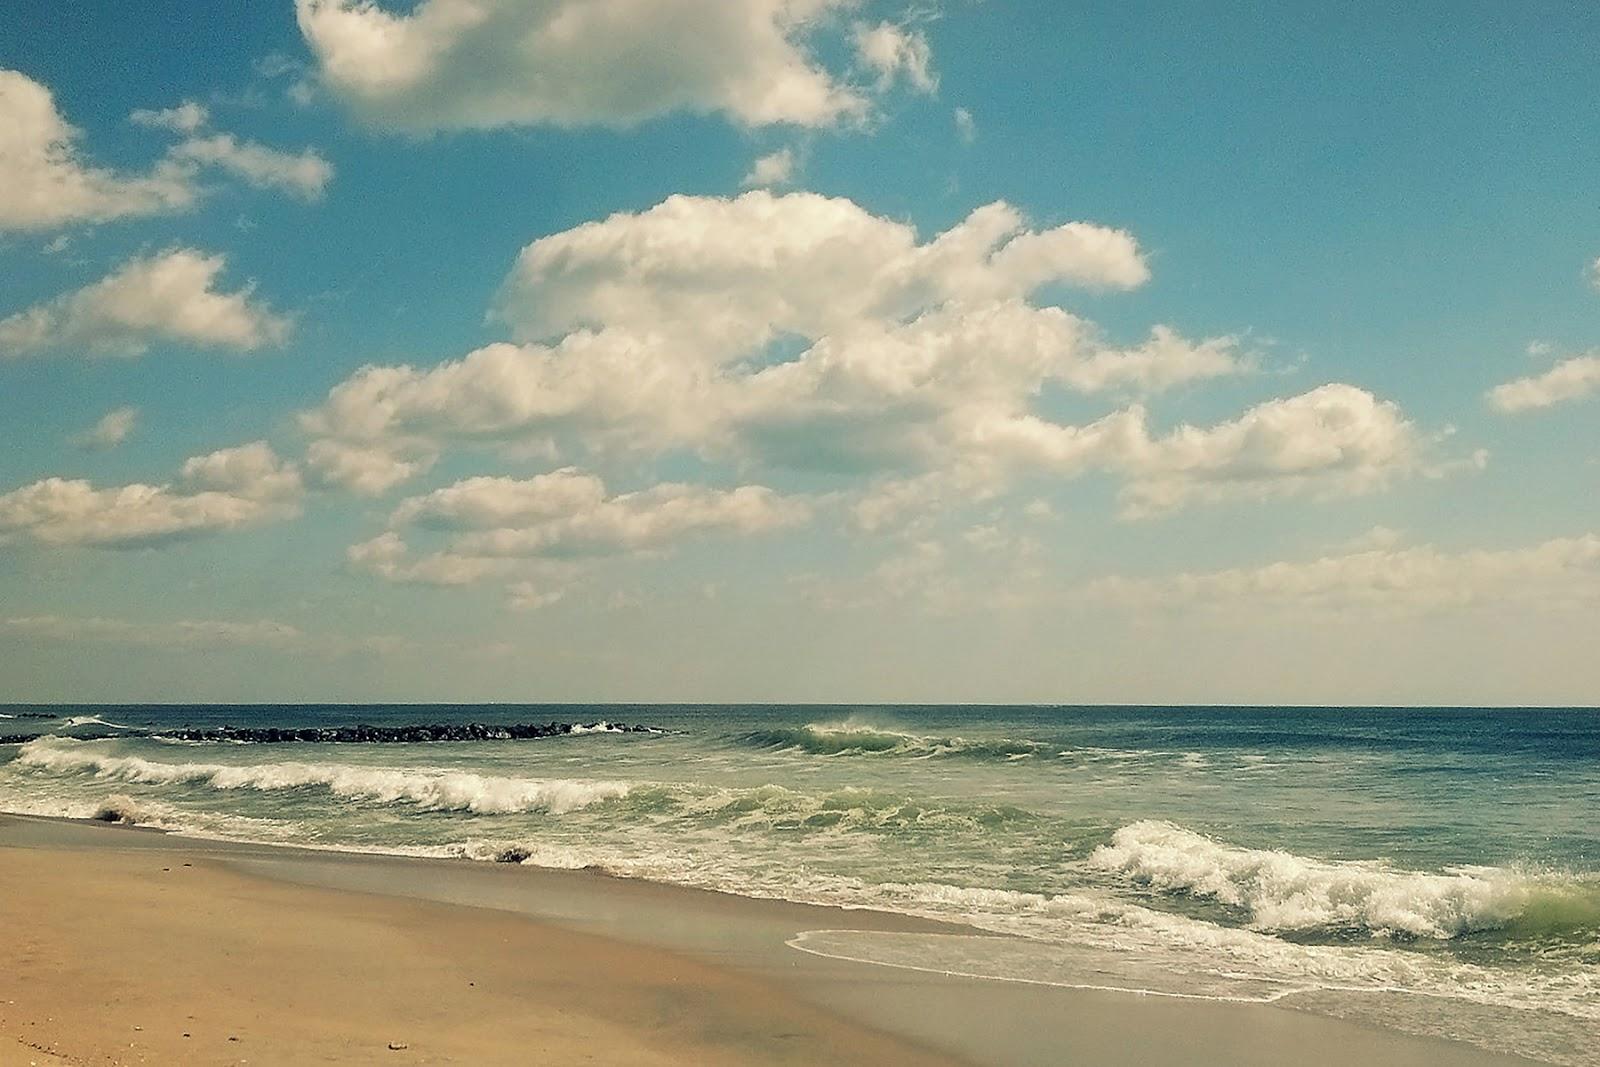 Exploring Photography with Joe Valencia: The Jersey Shore